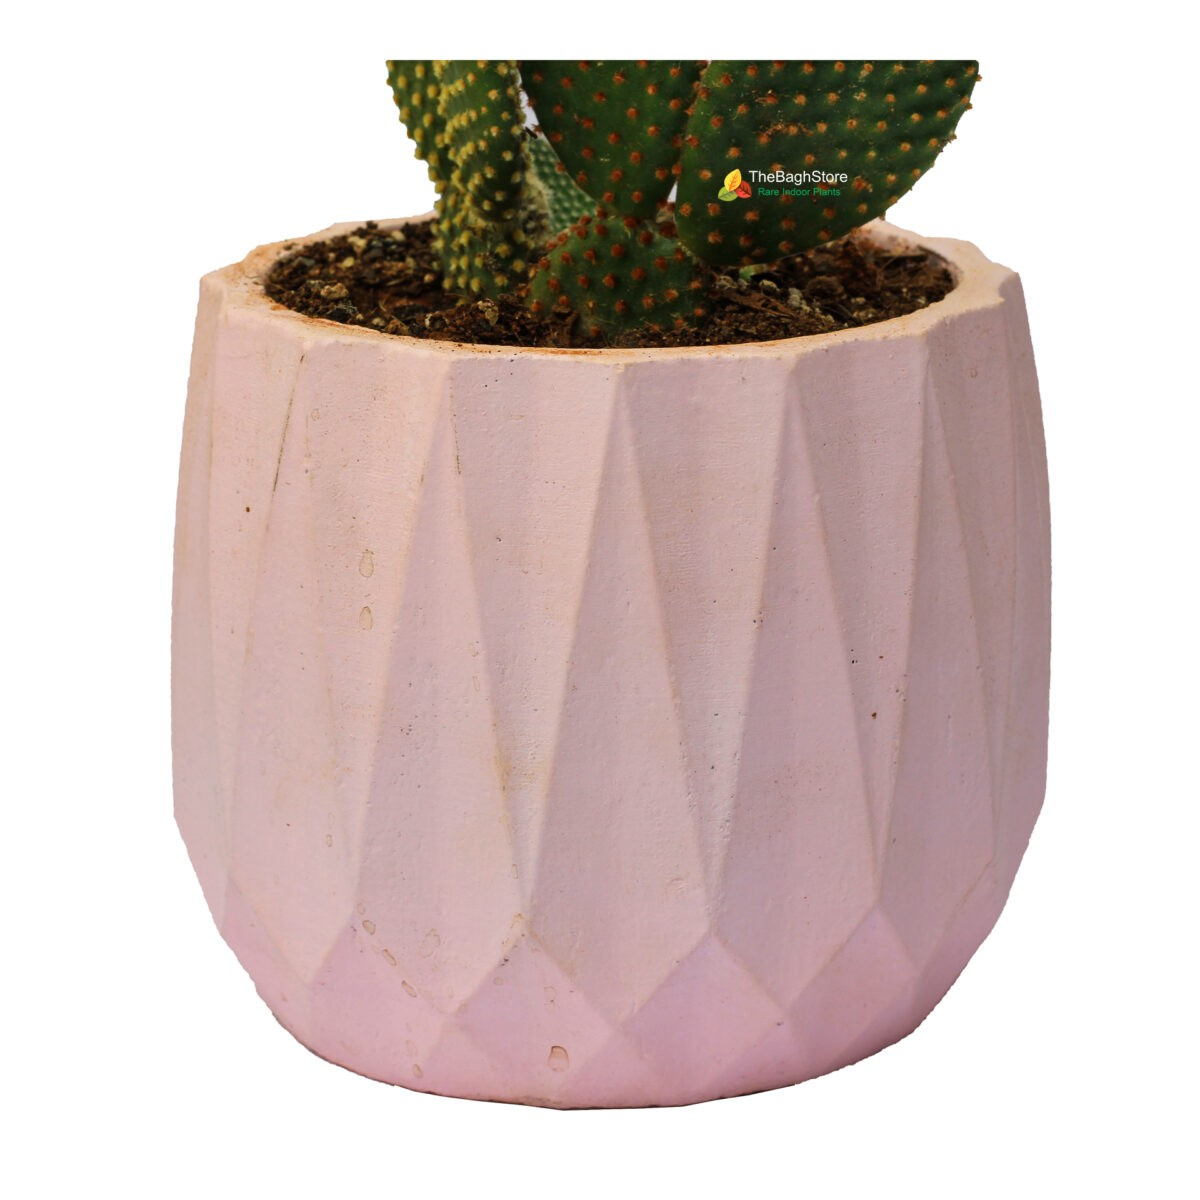 Bunny Ear Cactus in a pink concrete pot - Online Plant Nursery